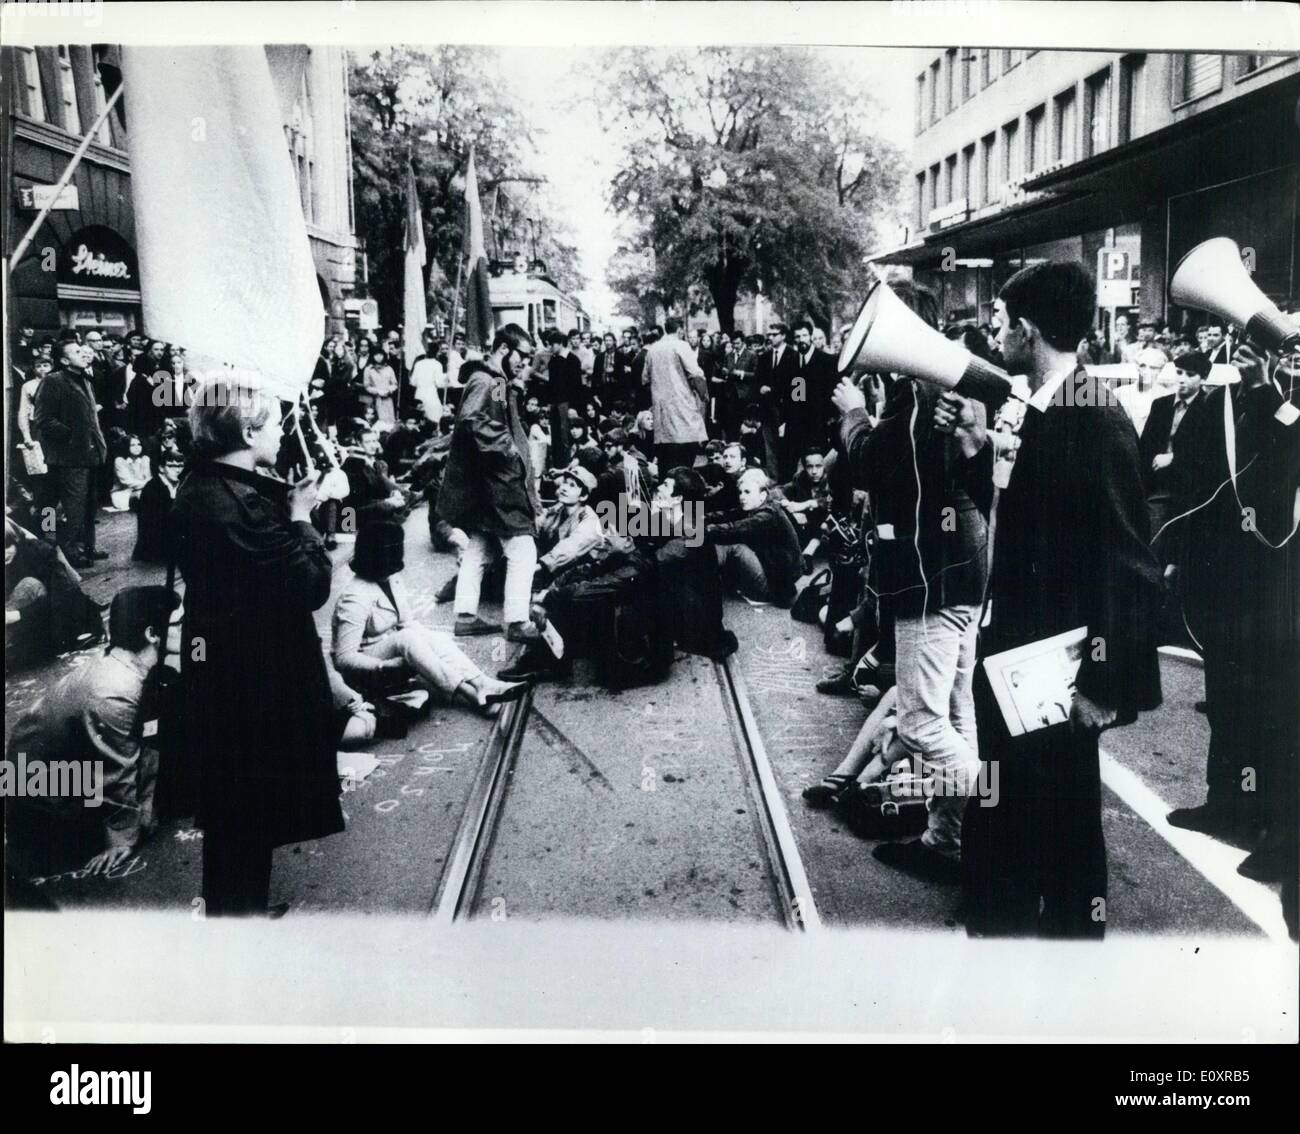 Oct  10, 1967 - Ati-Vietnam War Demonstration In zurich: Like many